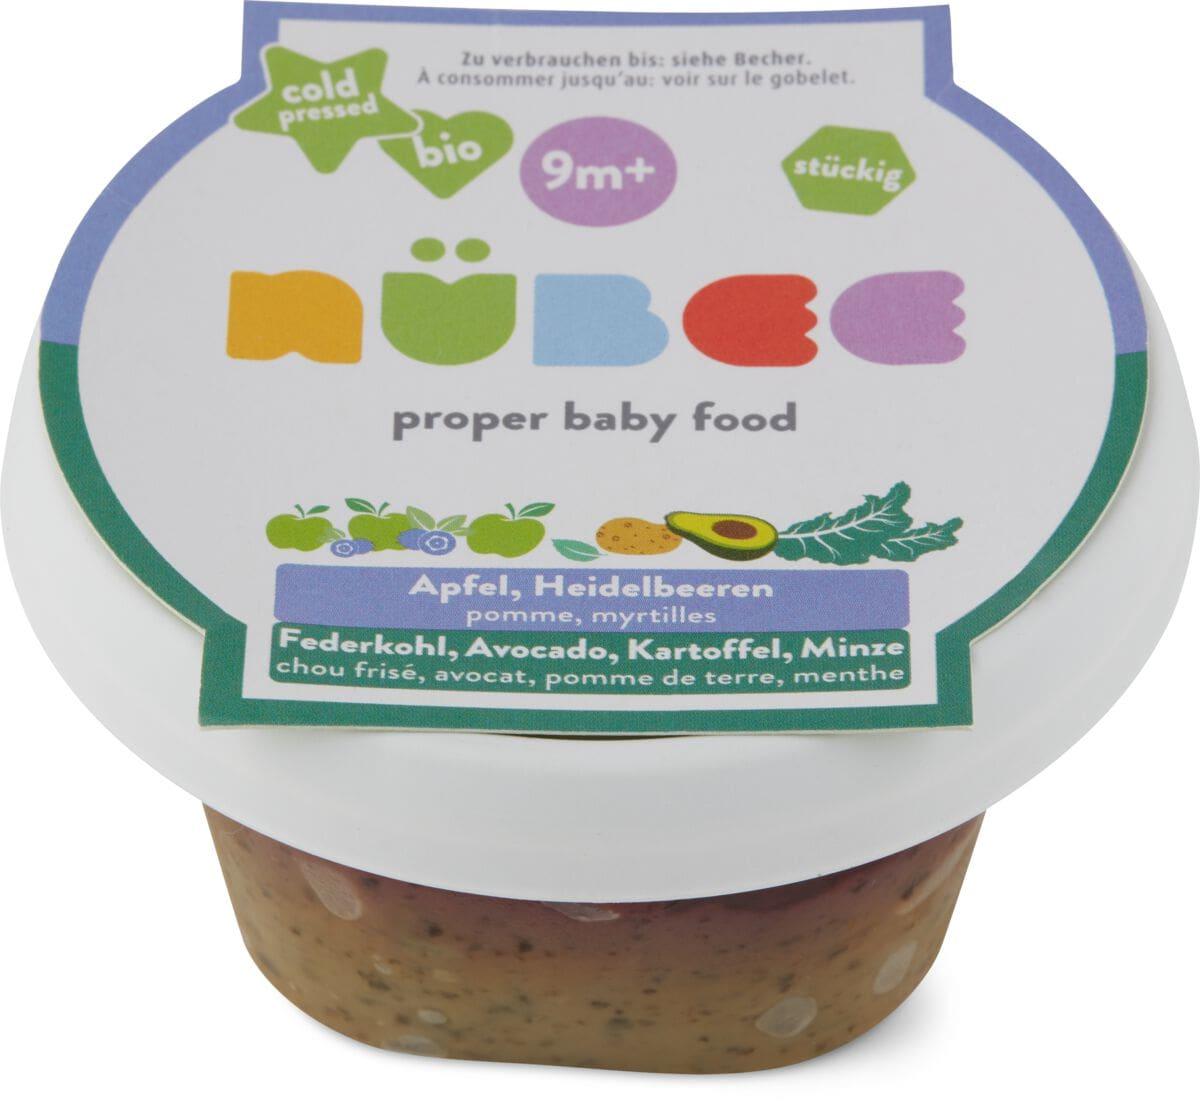 Nübee Apfel, Heidelbeeren, Federkohl, Avocado, Kartoffel, Minze